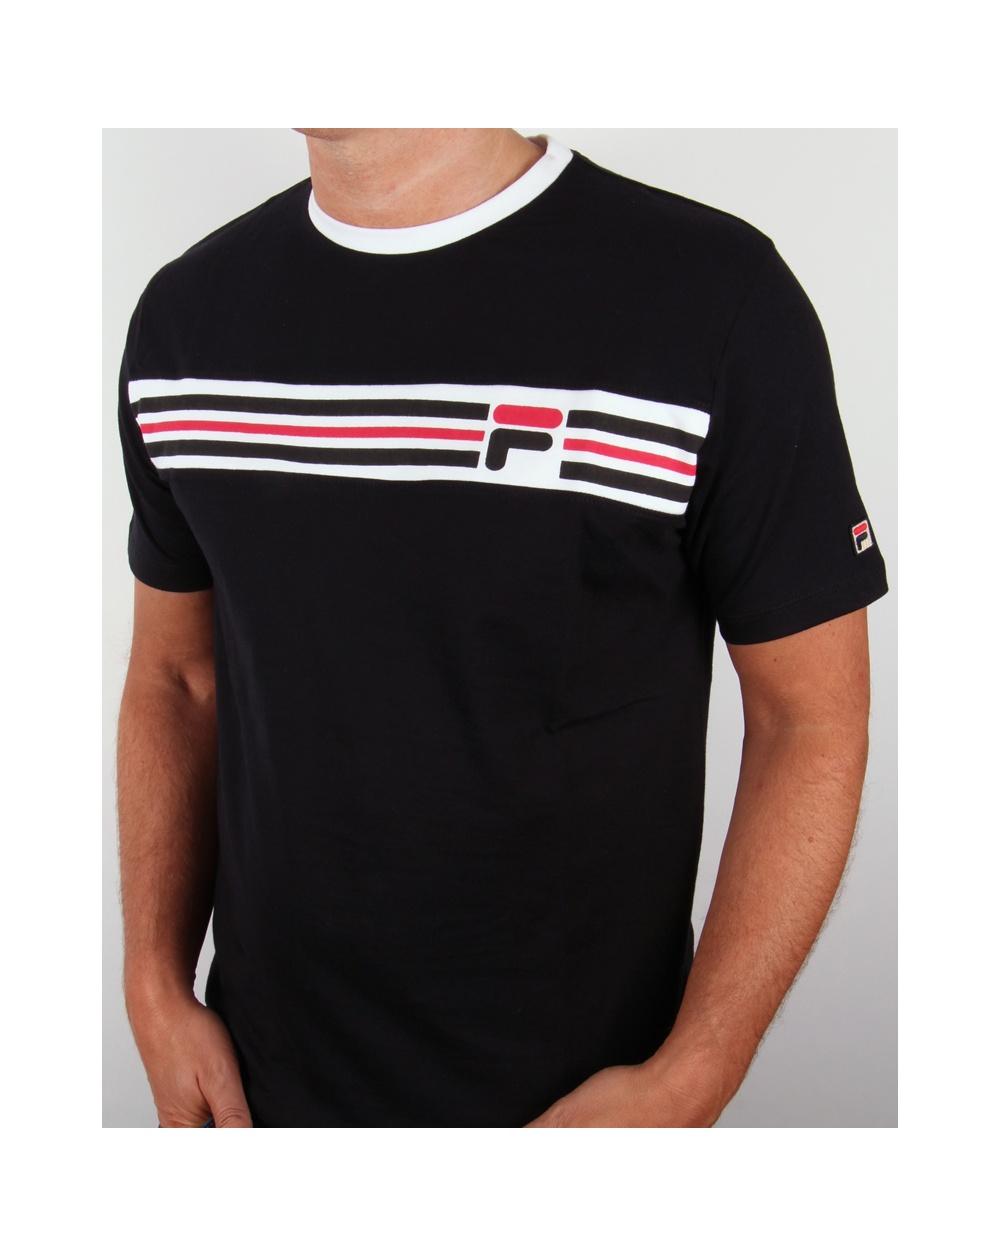 fila vintage headband stripe t shirt black fila vandorno. Black Bedroom Furniture Sets. Home Design Ideas